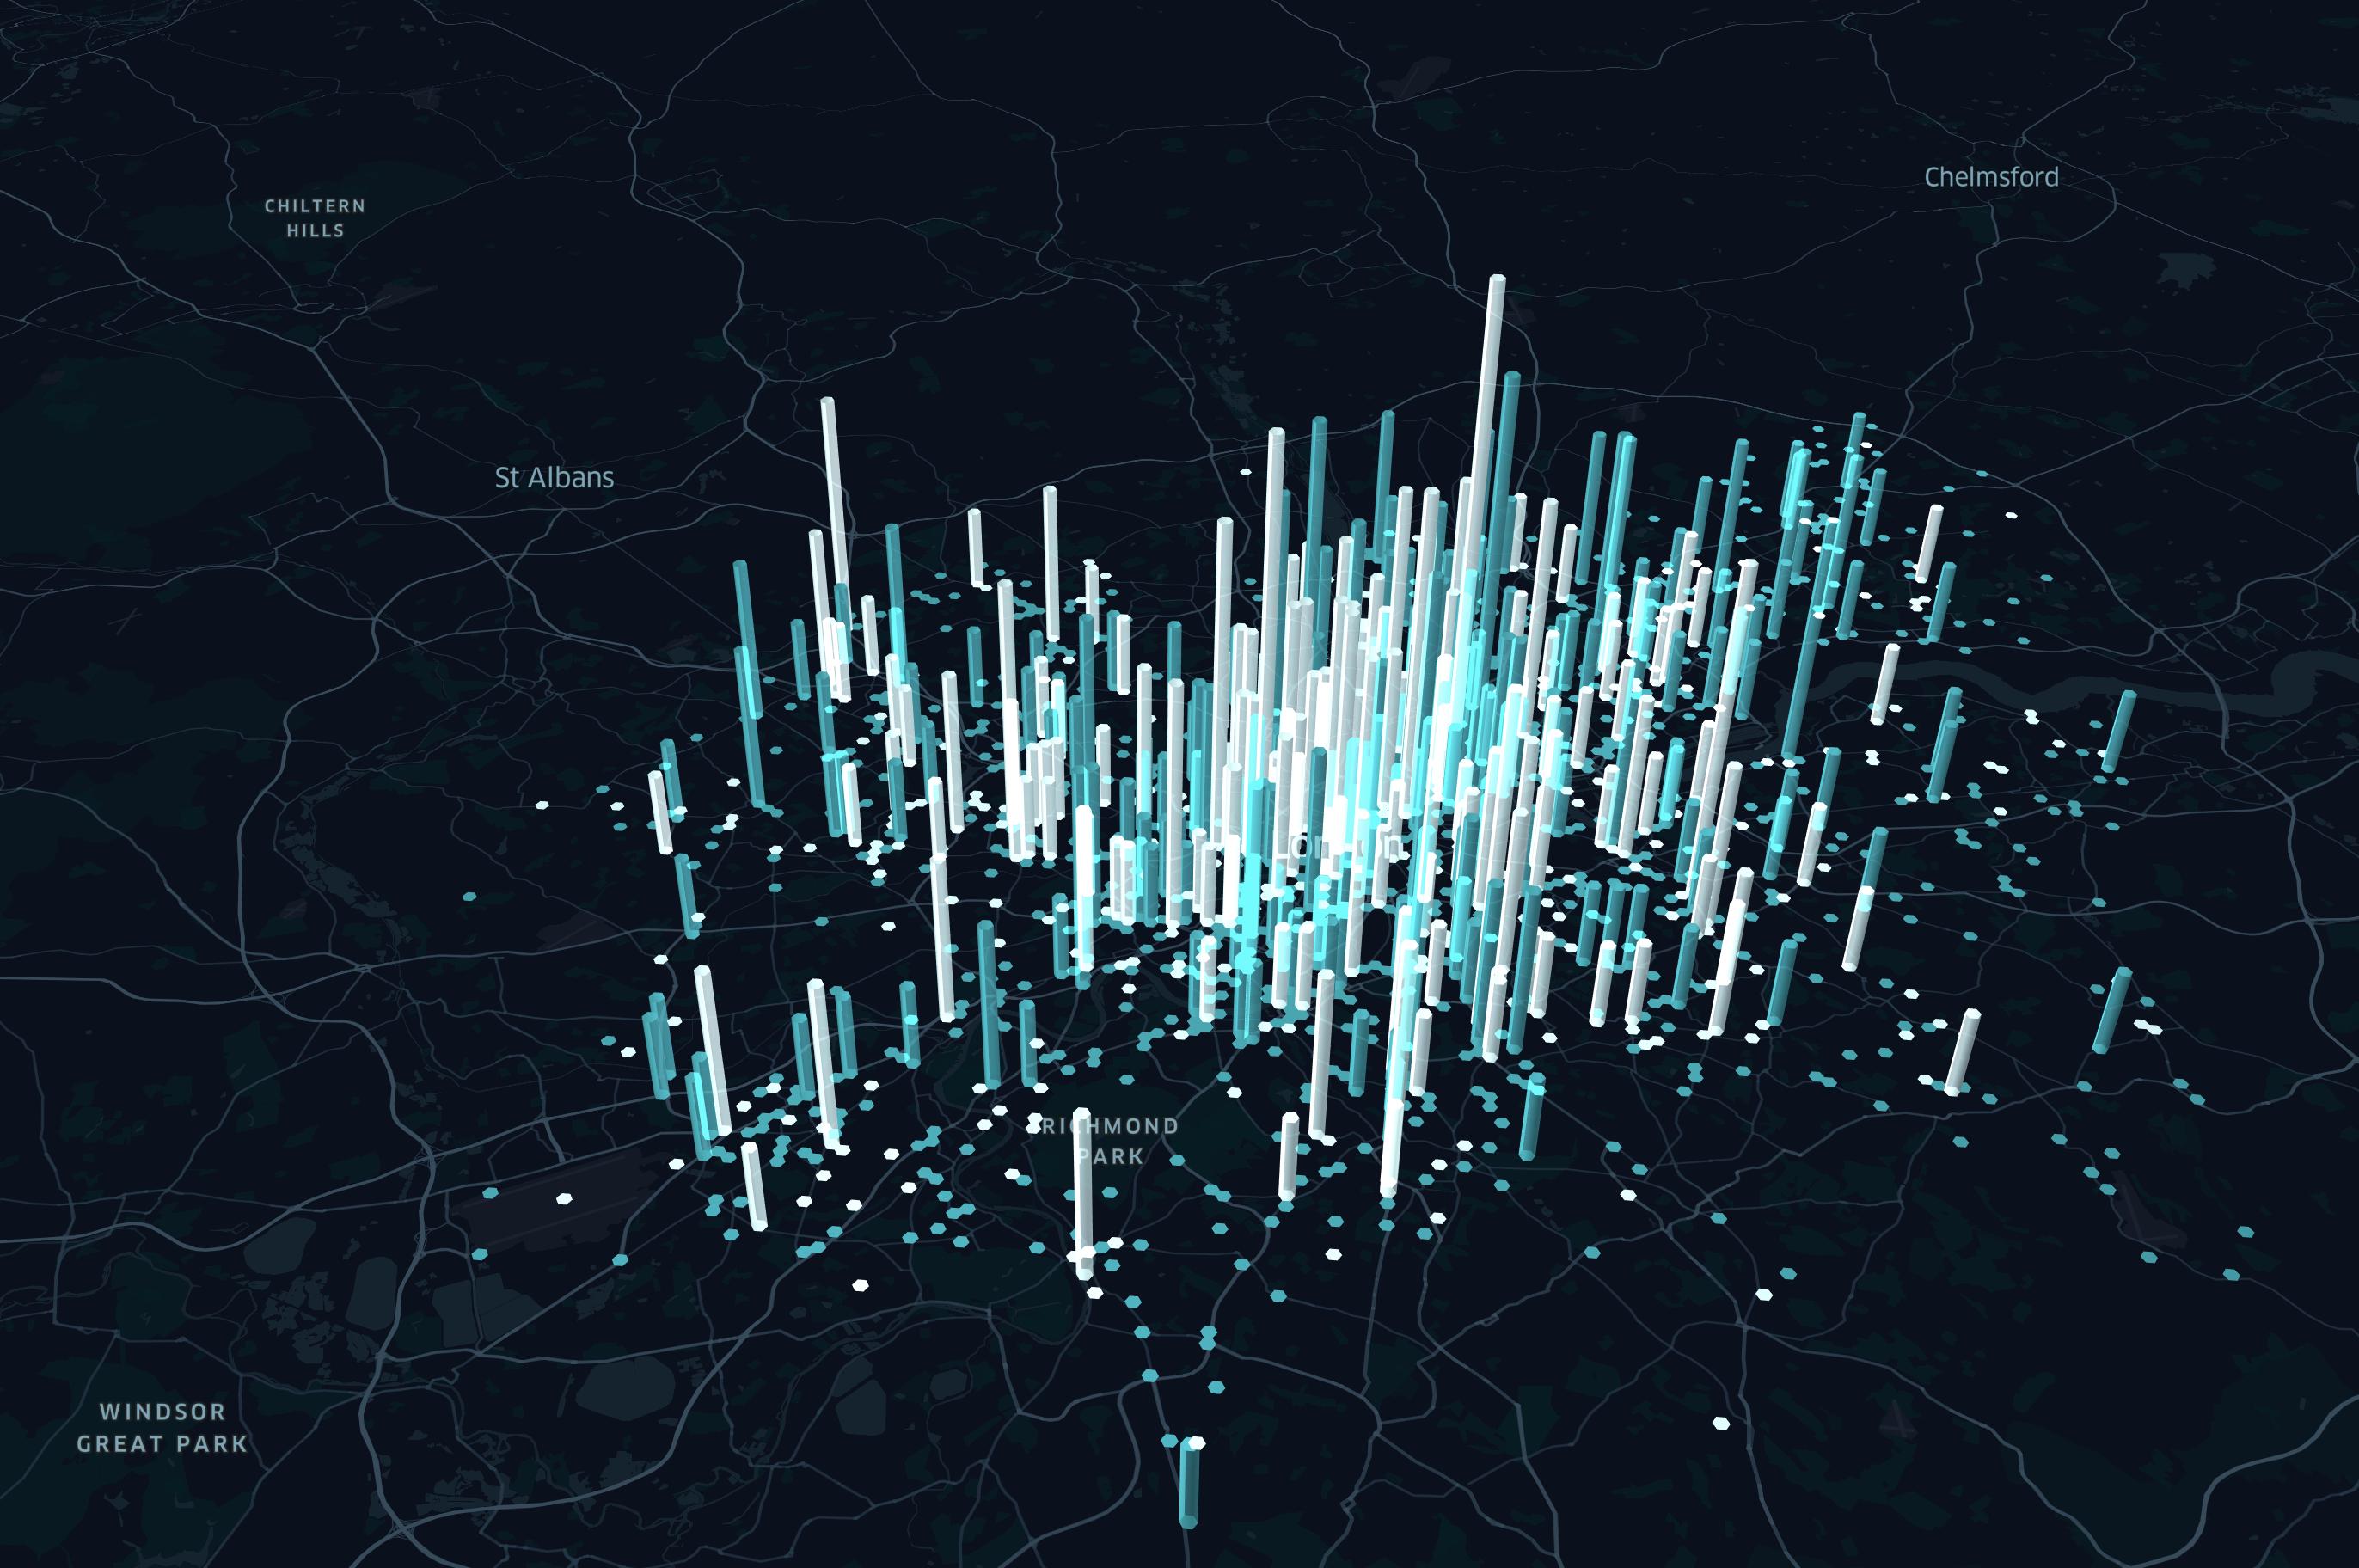 Landschaftskarte mit 3D Datensäulen